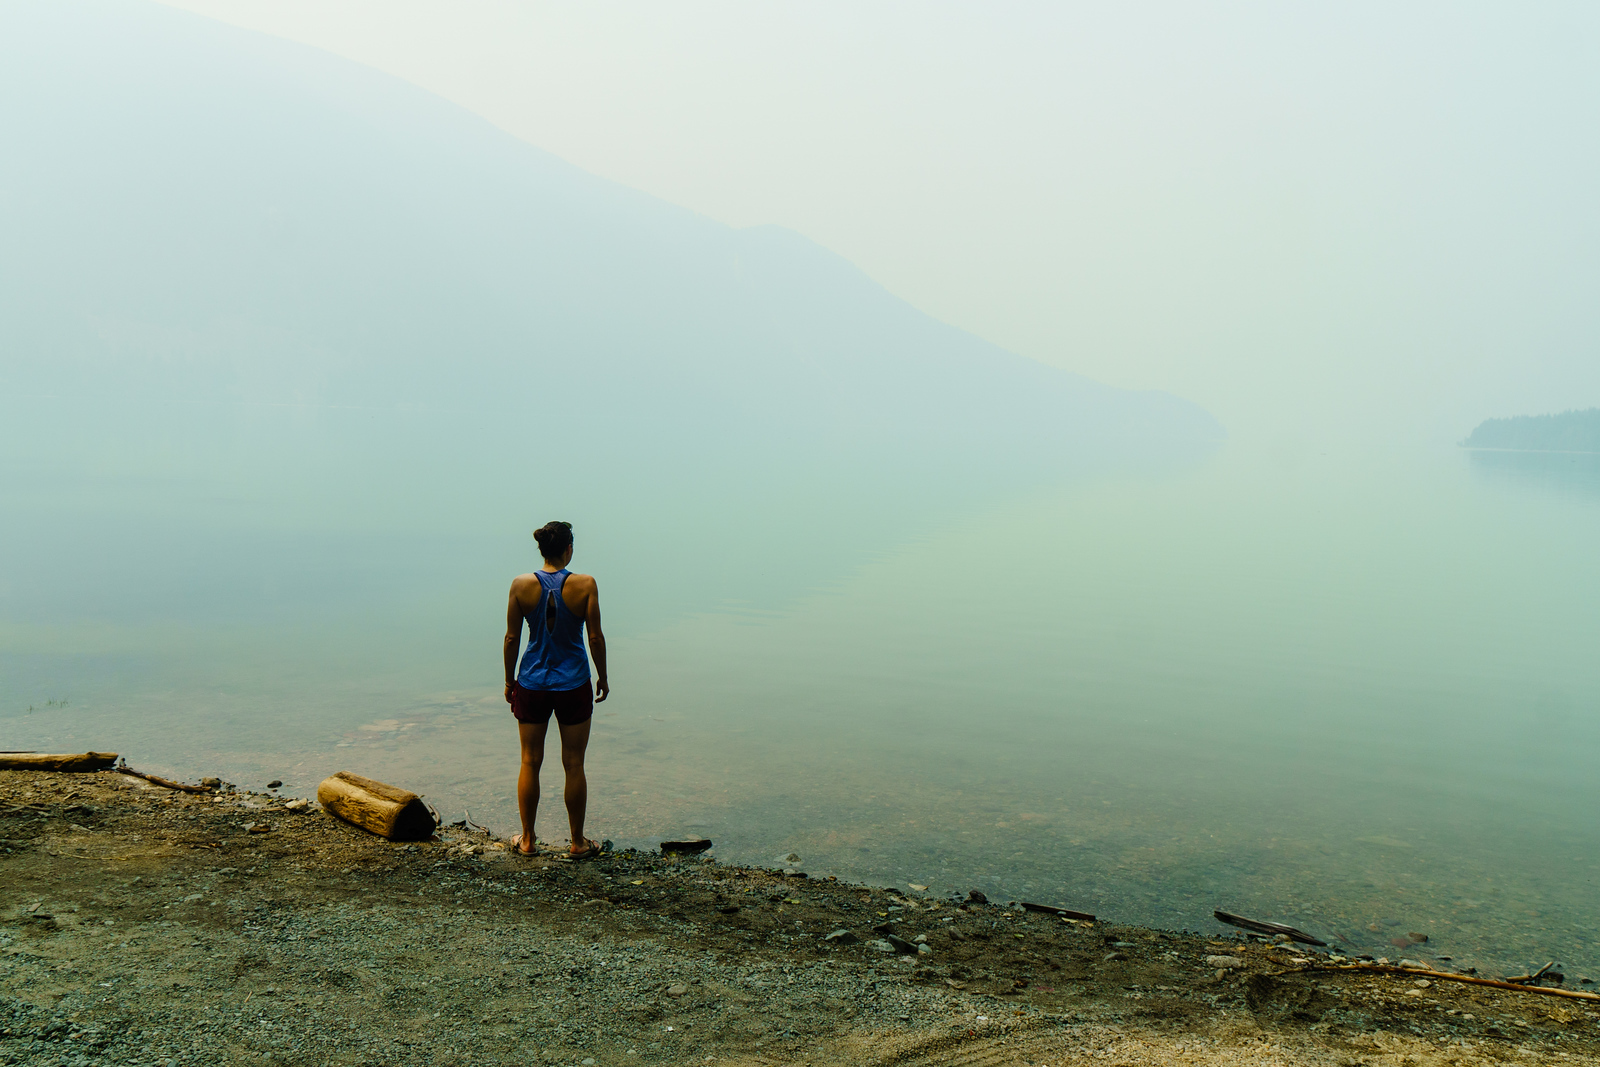 Daphnee Tuzlak at Lillooet Lake near Pemberton, British Columbia.